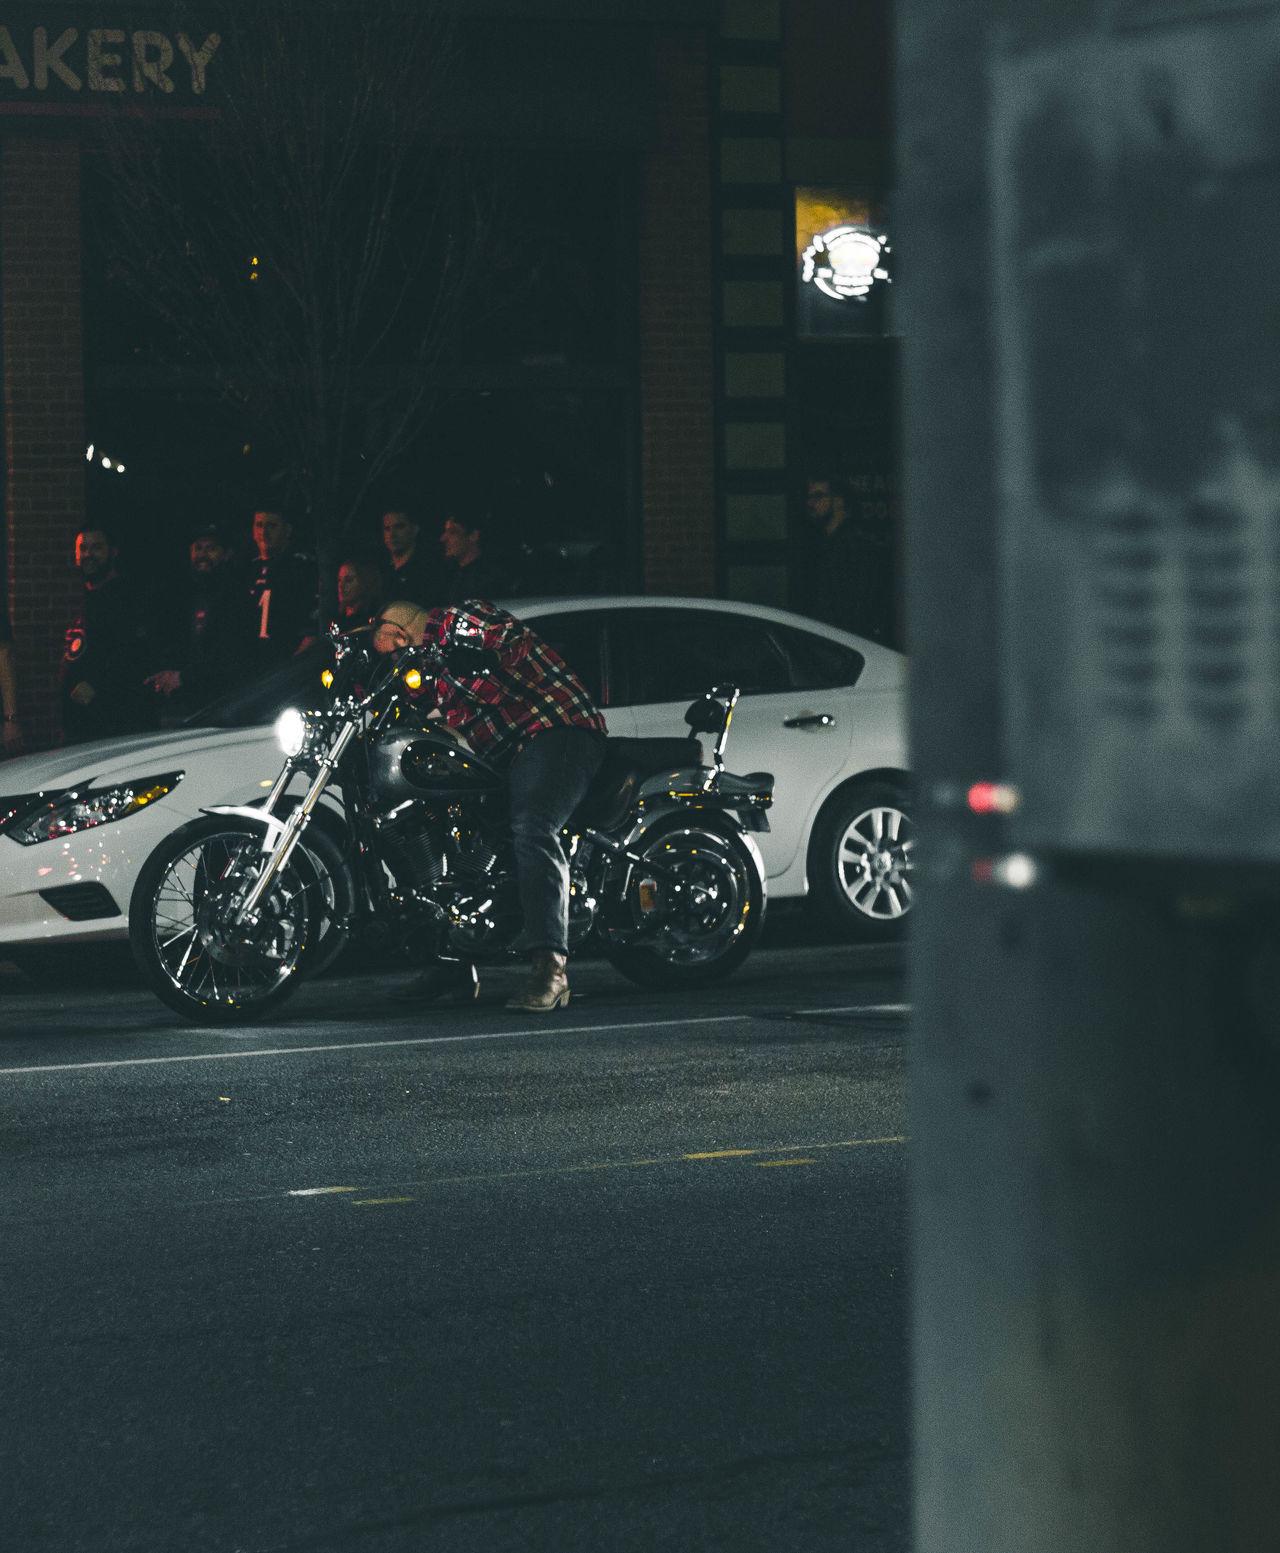 Agameoftones Cars City Grimey Illuminated Light Motorcycle Night Outdoors Rooftop Skyline Street Streetphotography Urban